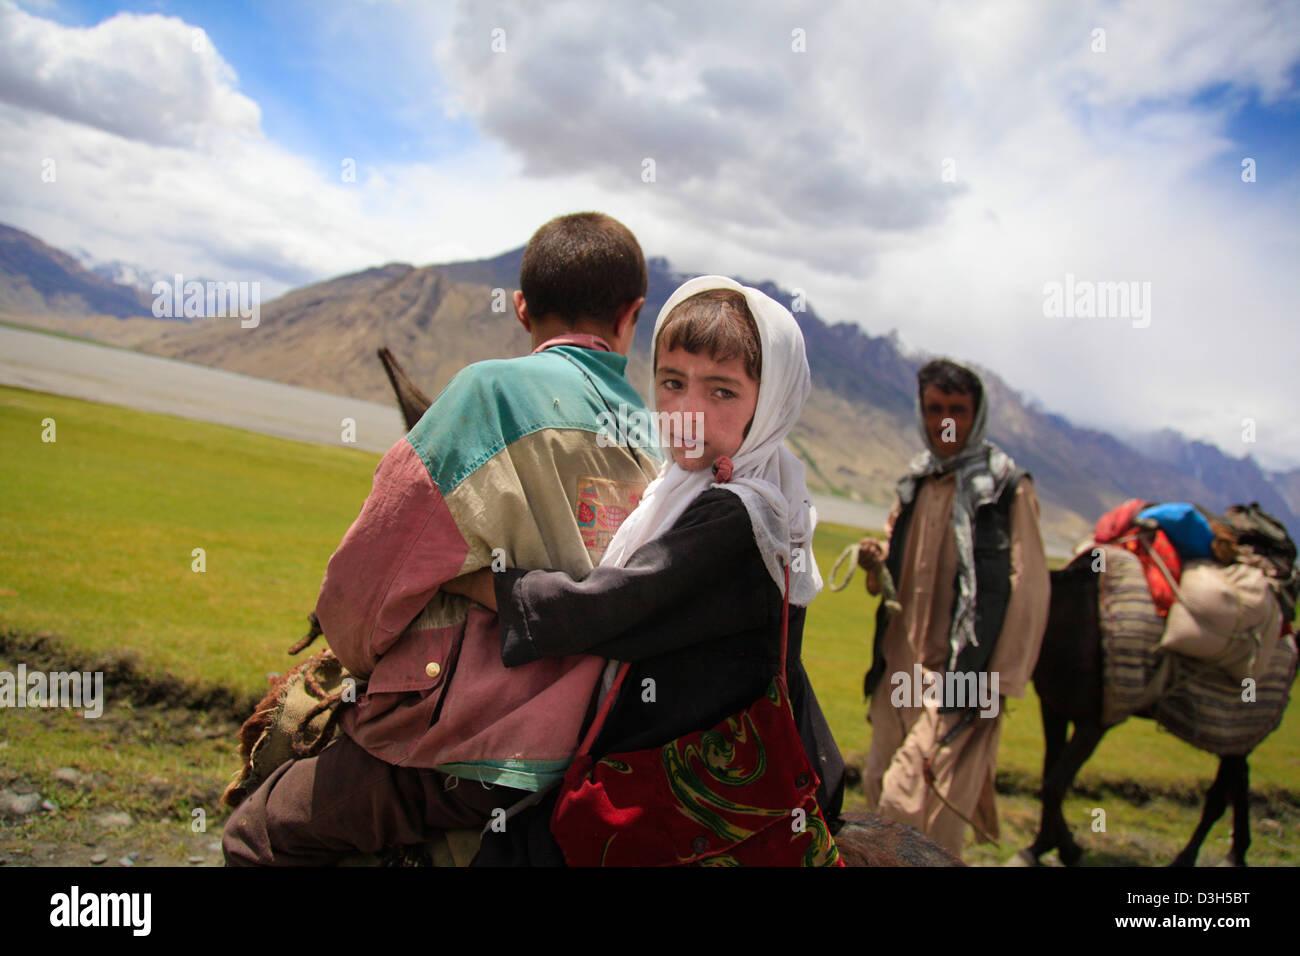 Schoolchildren on their way to school near Sarhad-e-broghil in the Wakhan Corridor, Badakhshan, Afghanistan Stock Photo